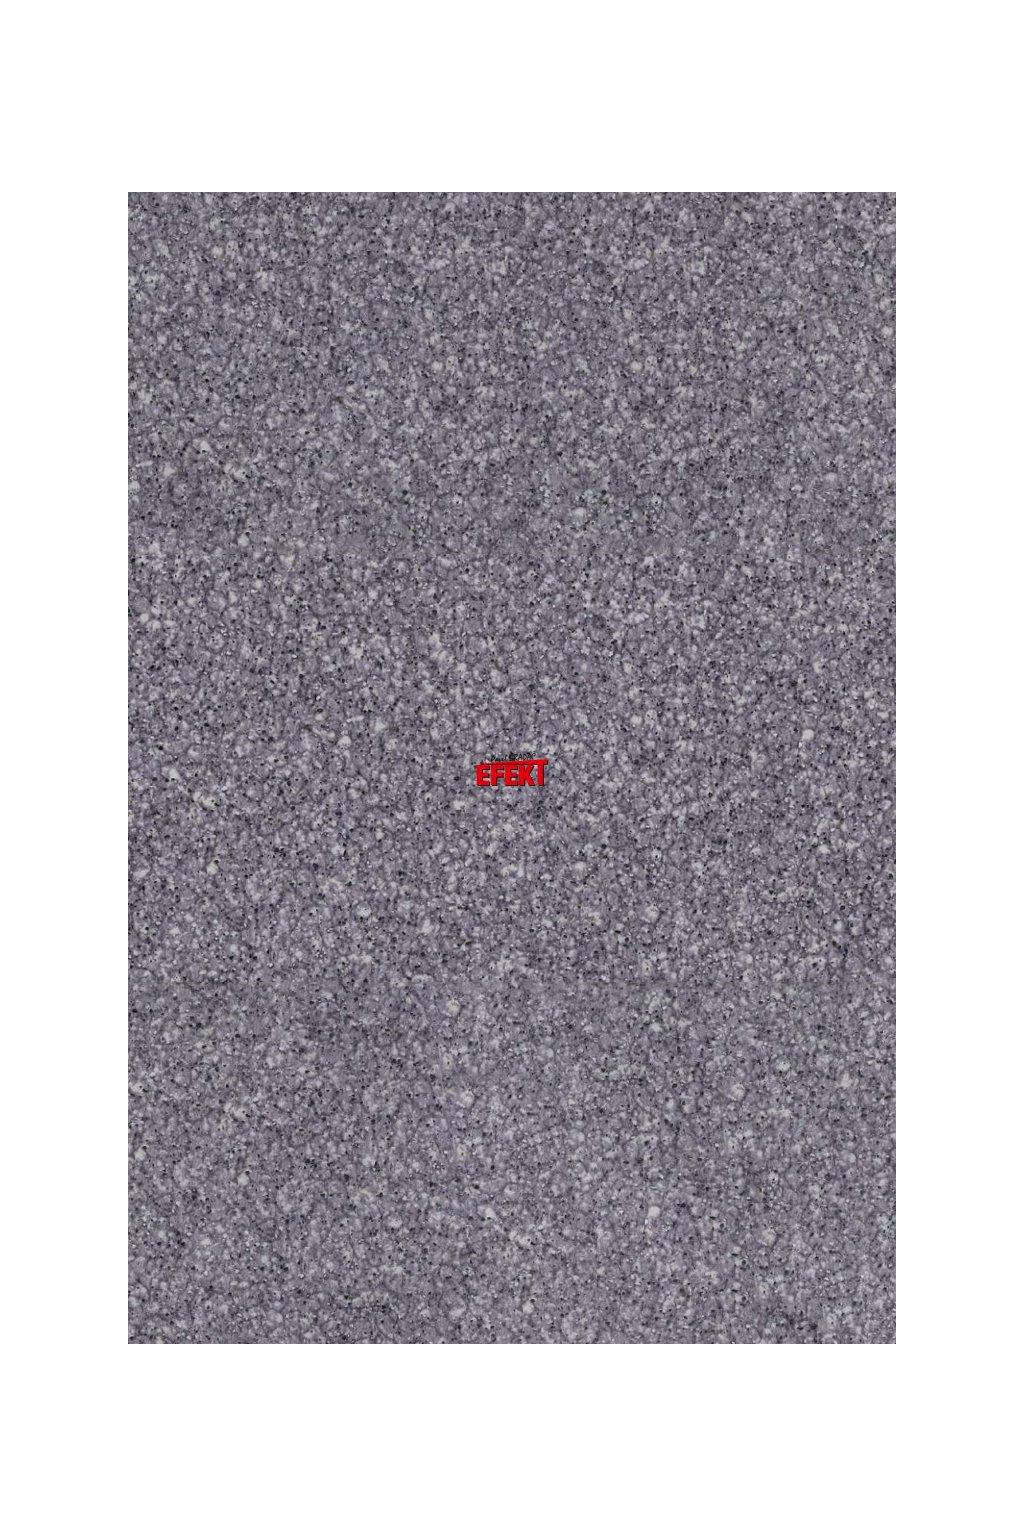 Gerflor Timberline Pixel Anthracite 0632